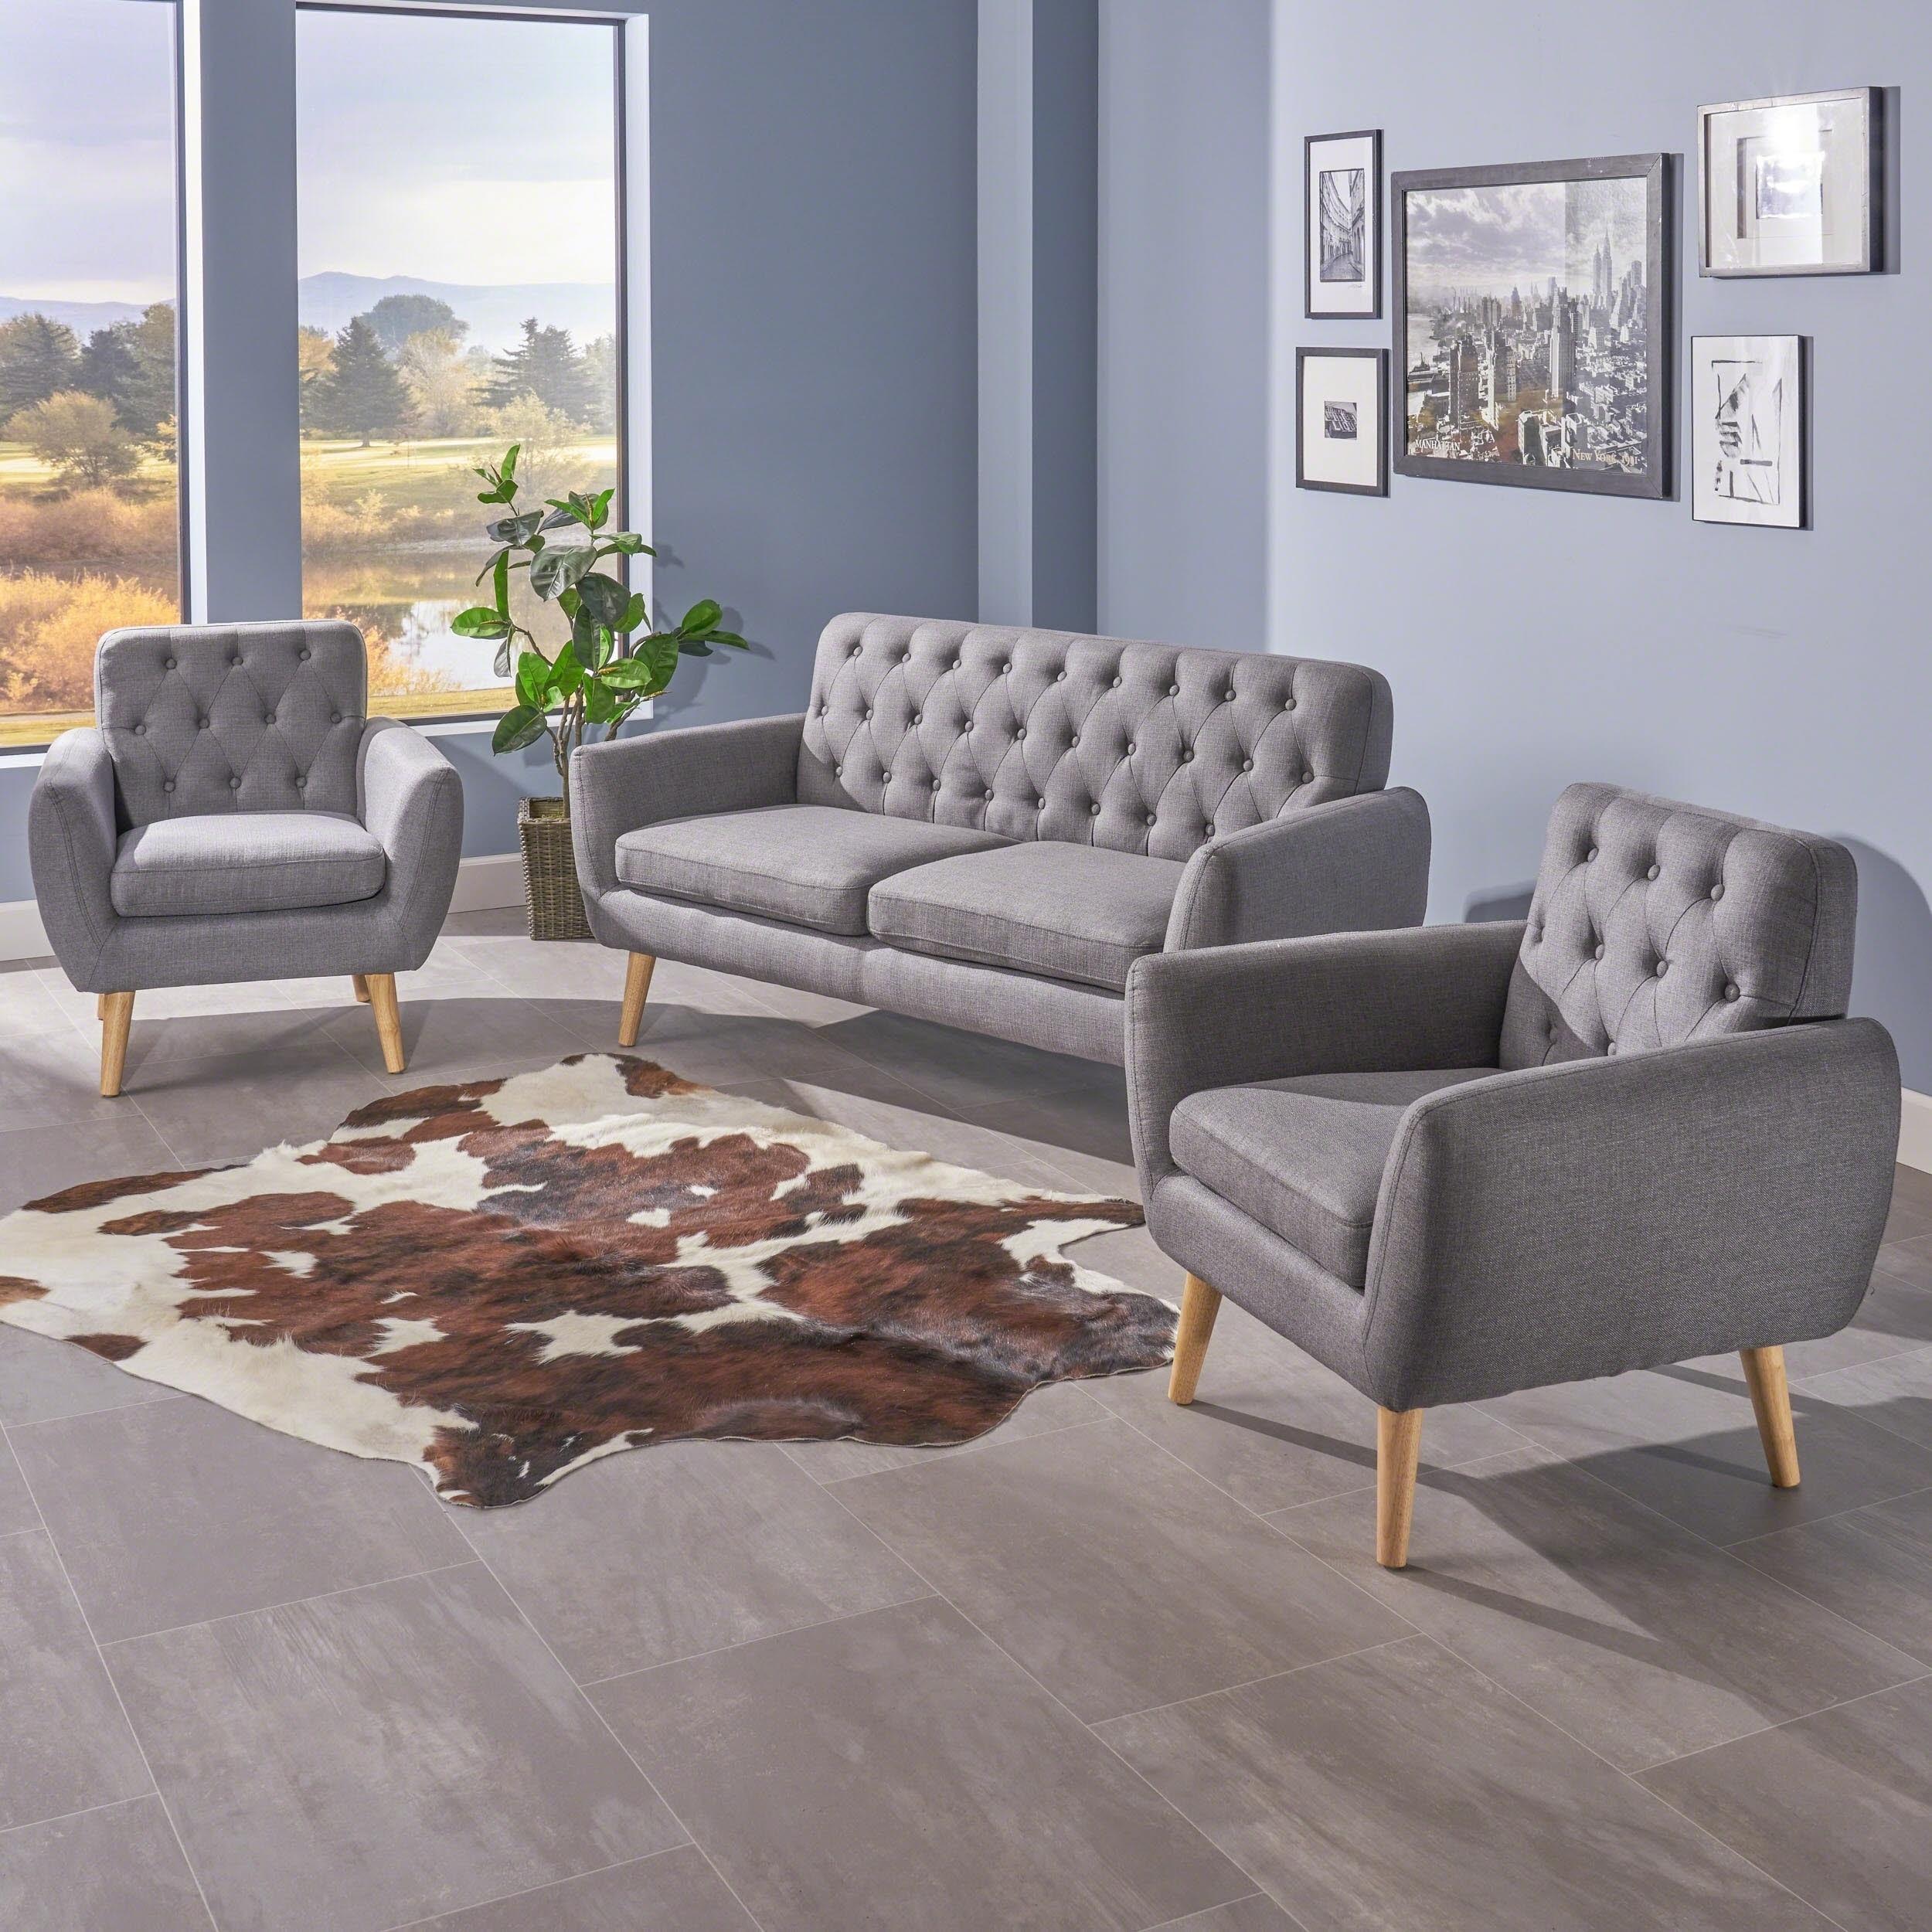 Shop Bernice Mid Century Modern Petite 3-piece Fabric Sofa Set by ...